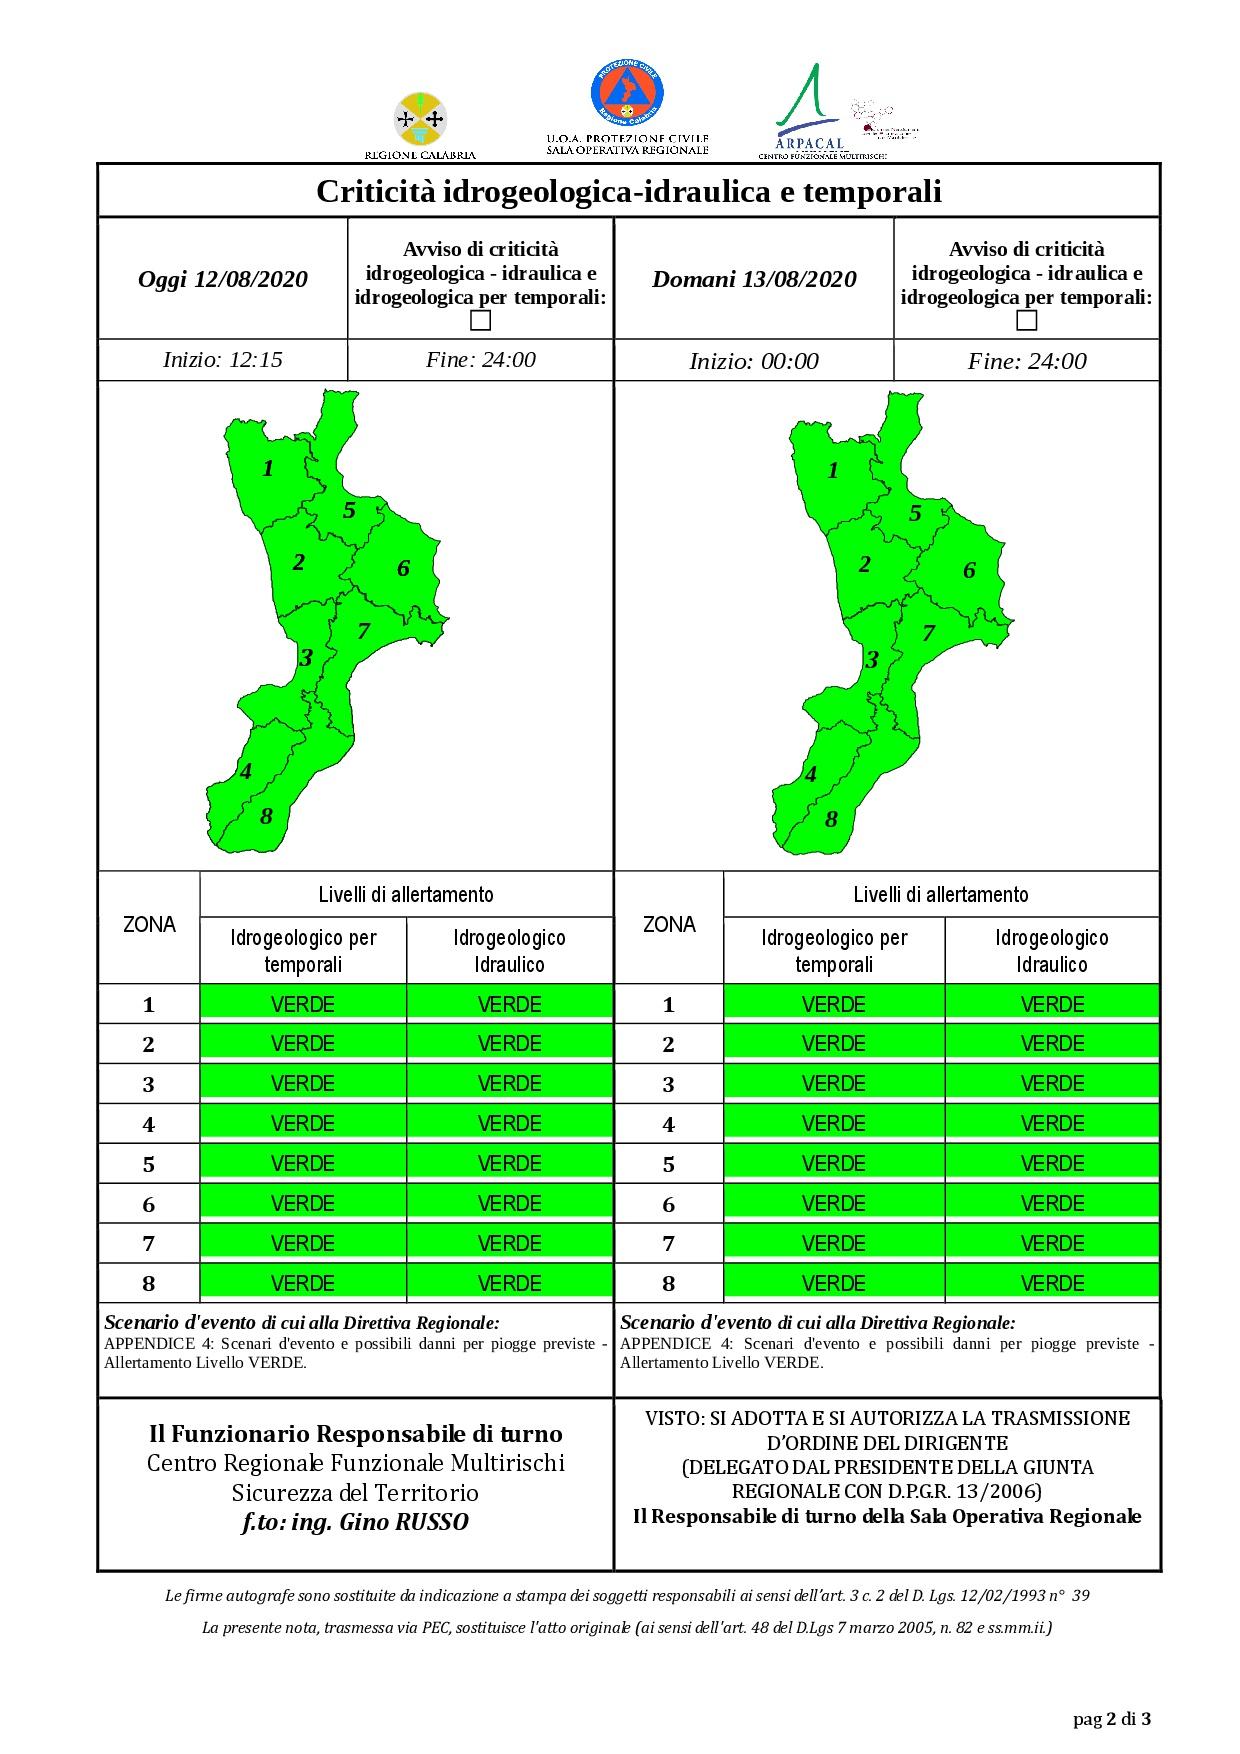 Criticità idrogeologica-idraulica e temporali in Calabria 12-08-2020